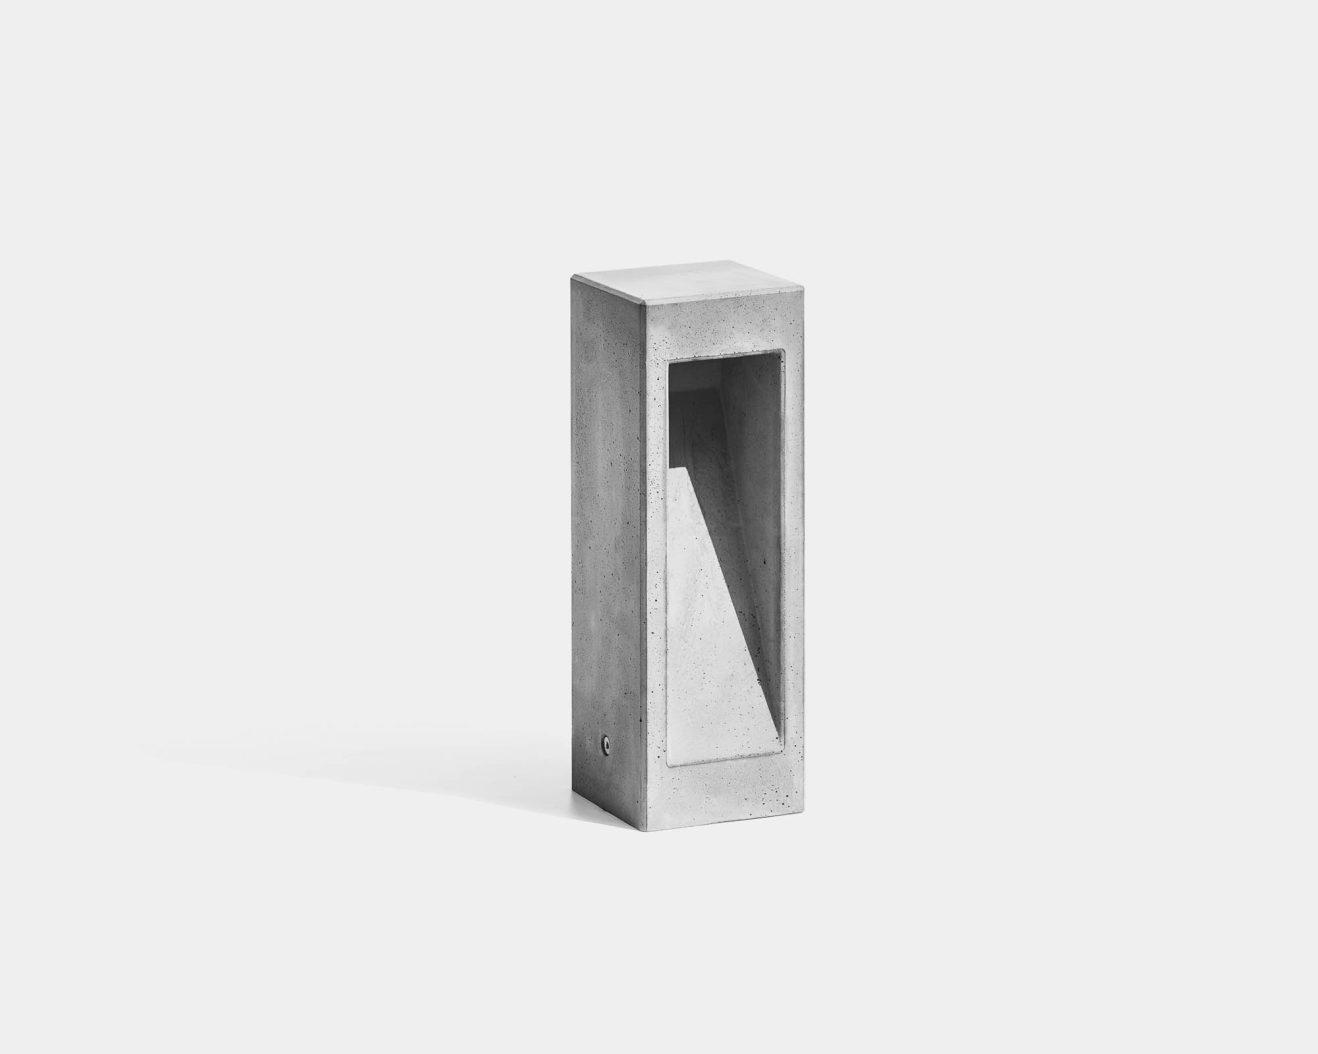 Cube-BentuDesign-Floorlamp2